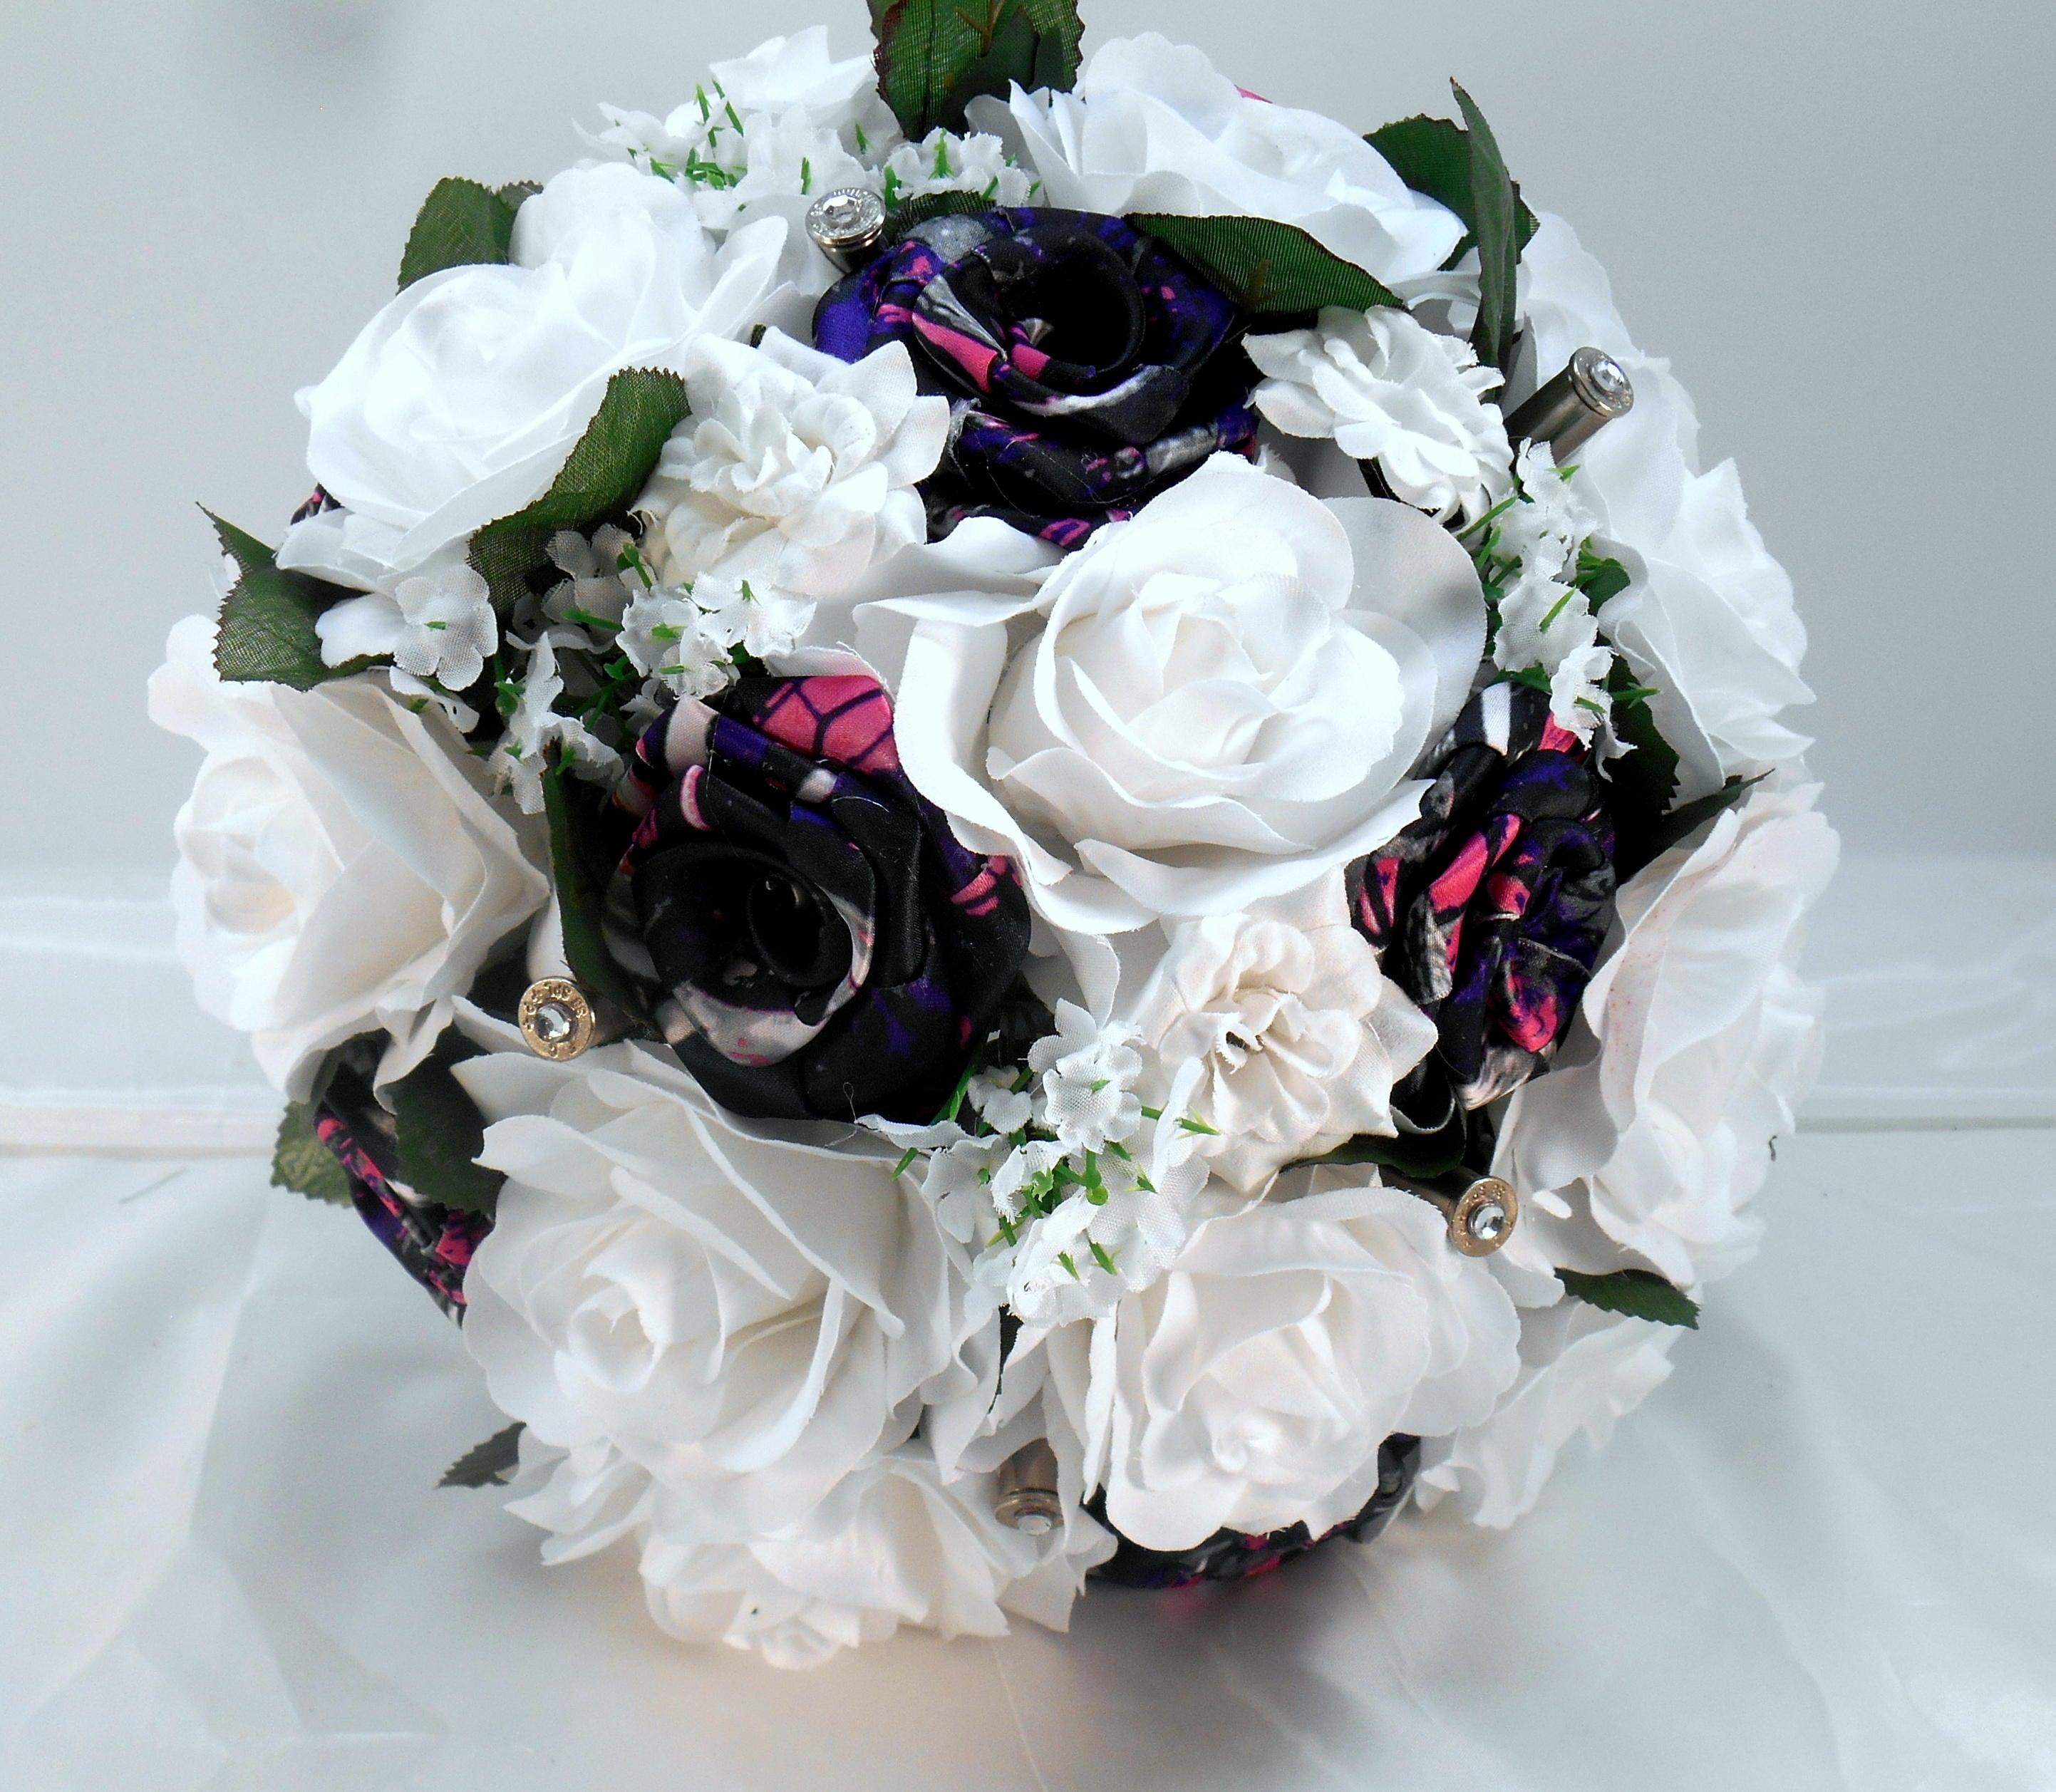 Camo Flower Bouquet Image collections - Flower Wallpaper HD